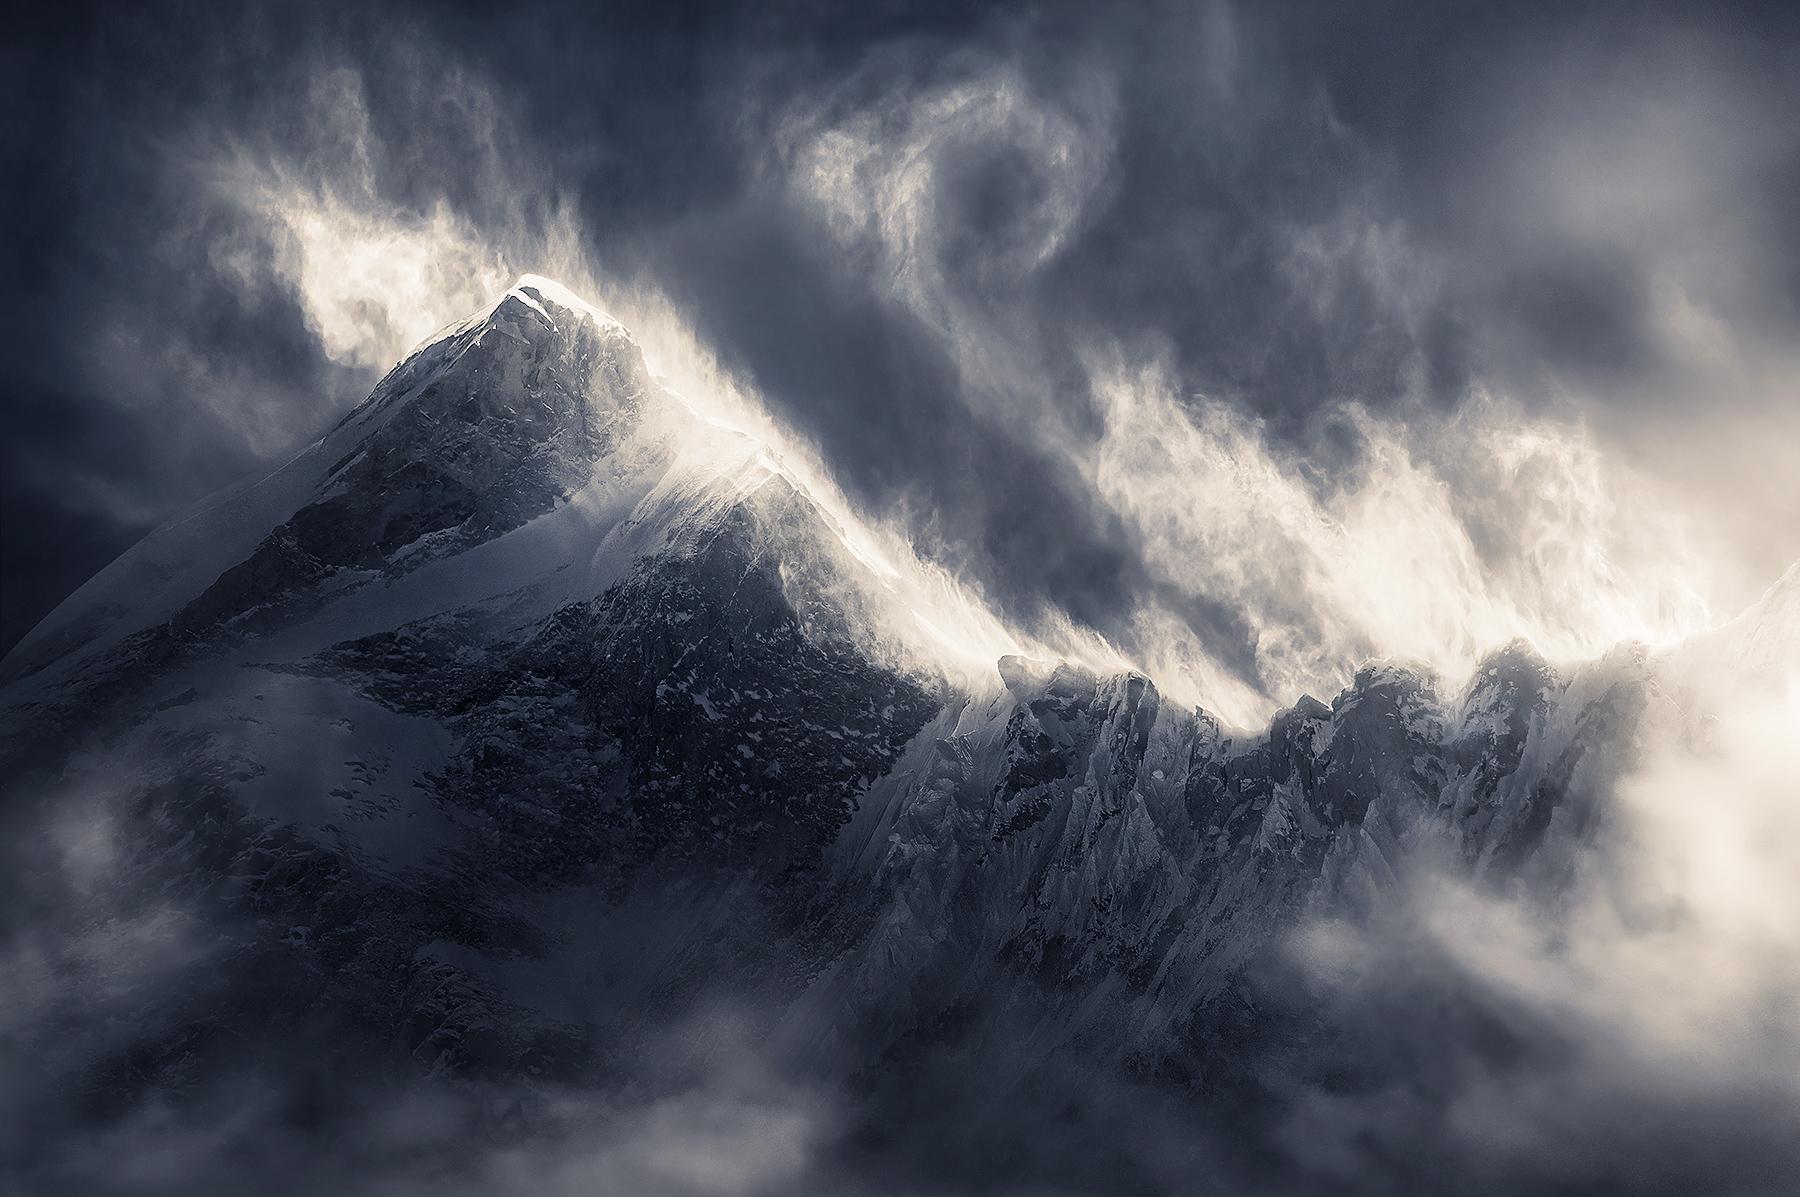 Makalu, snow, blowing, wind, storm, power, dramatic, winter, cold, himalaya, tibet, photo